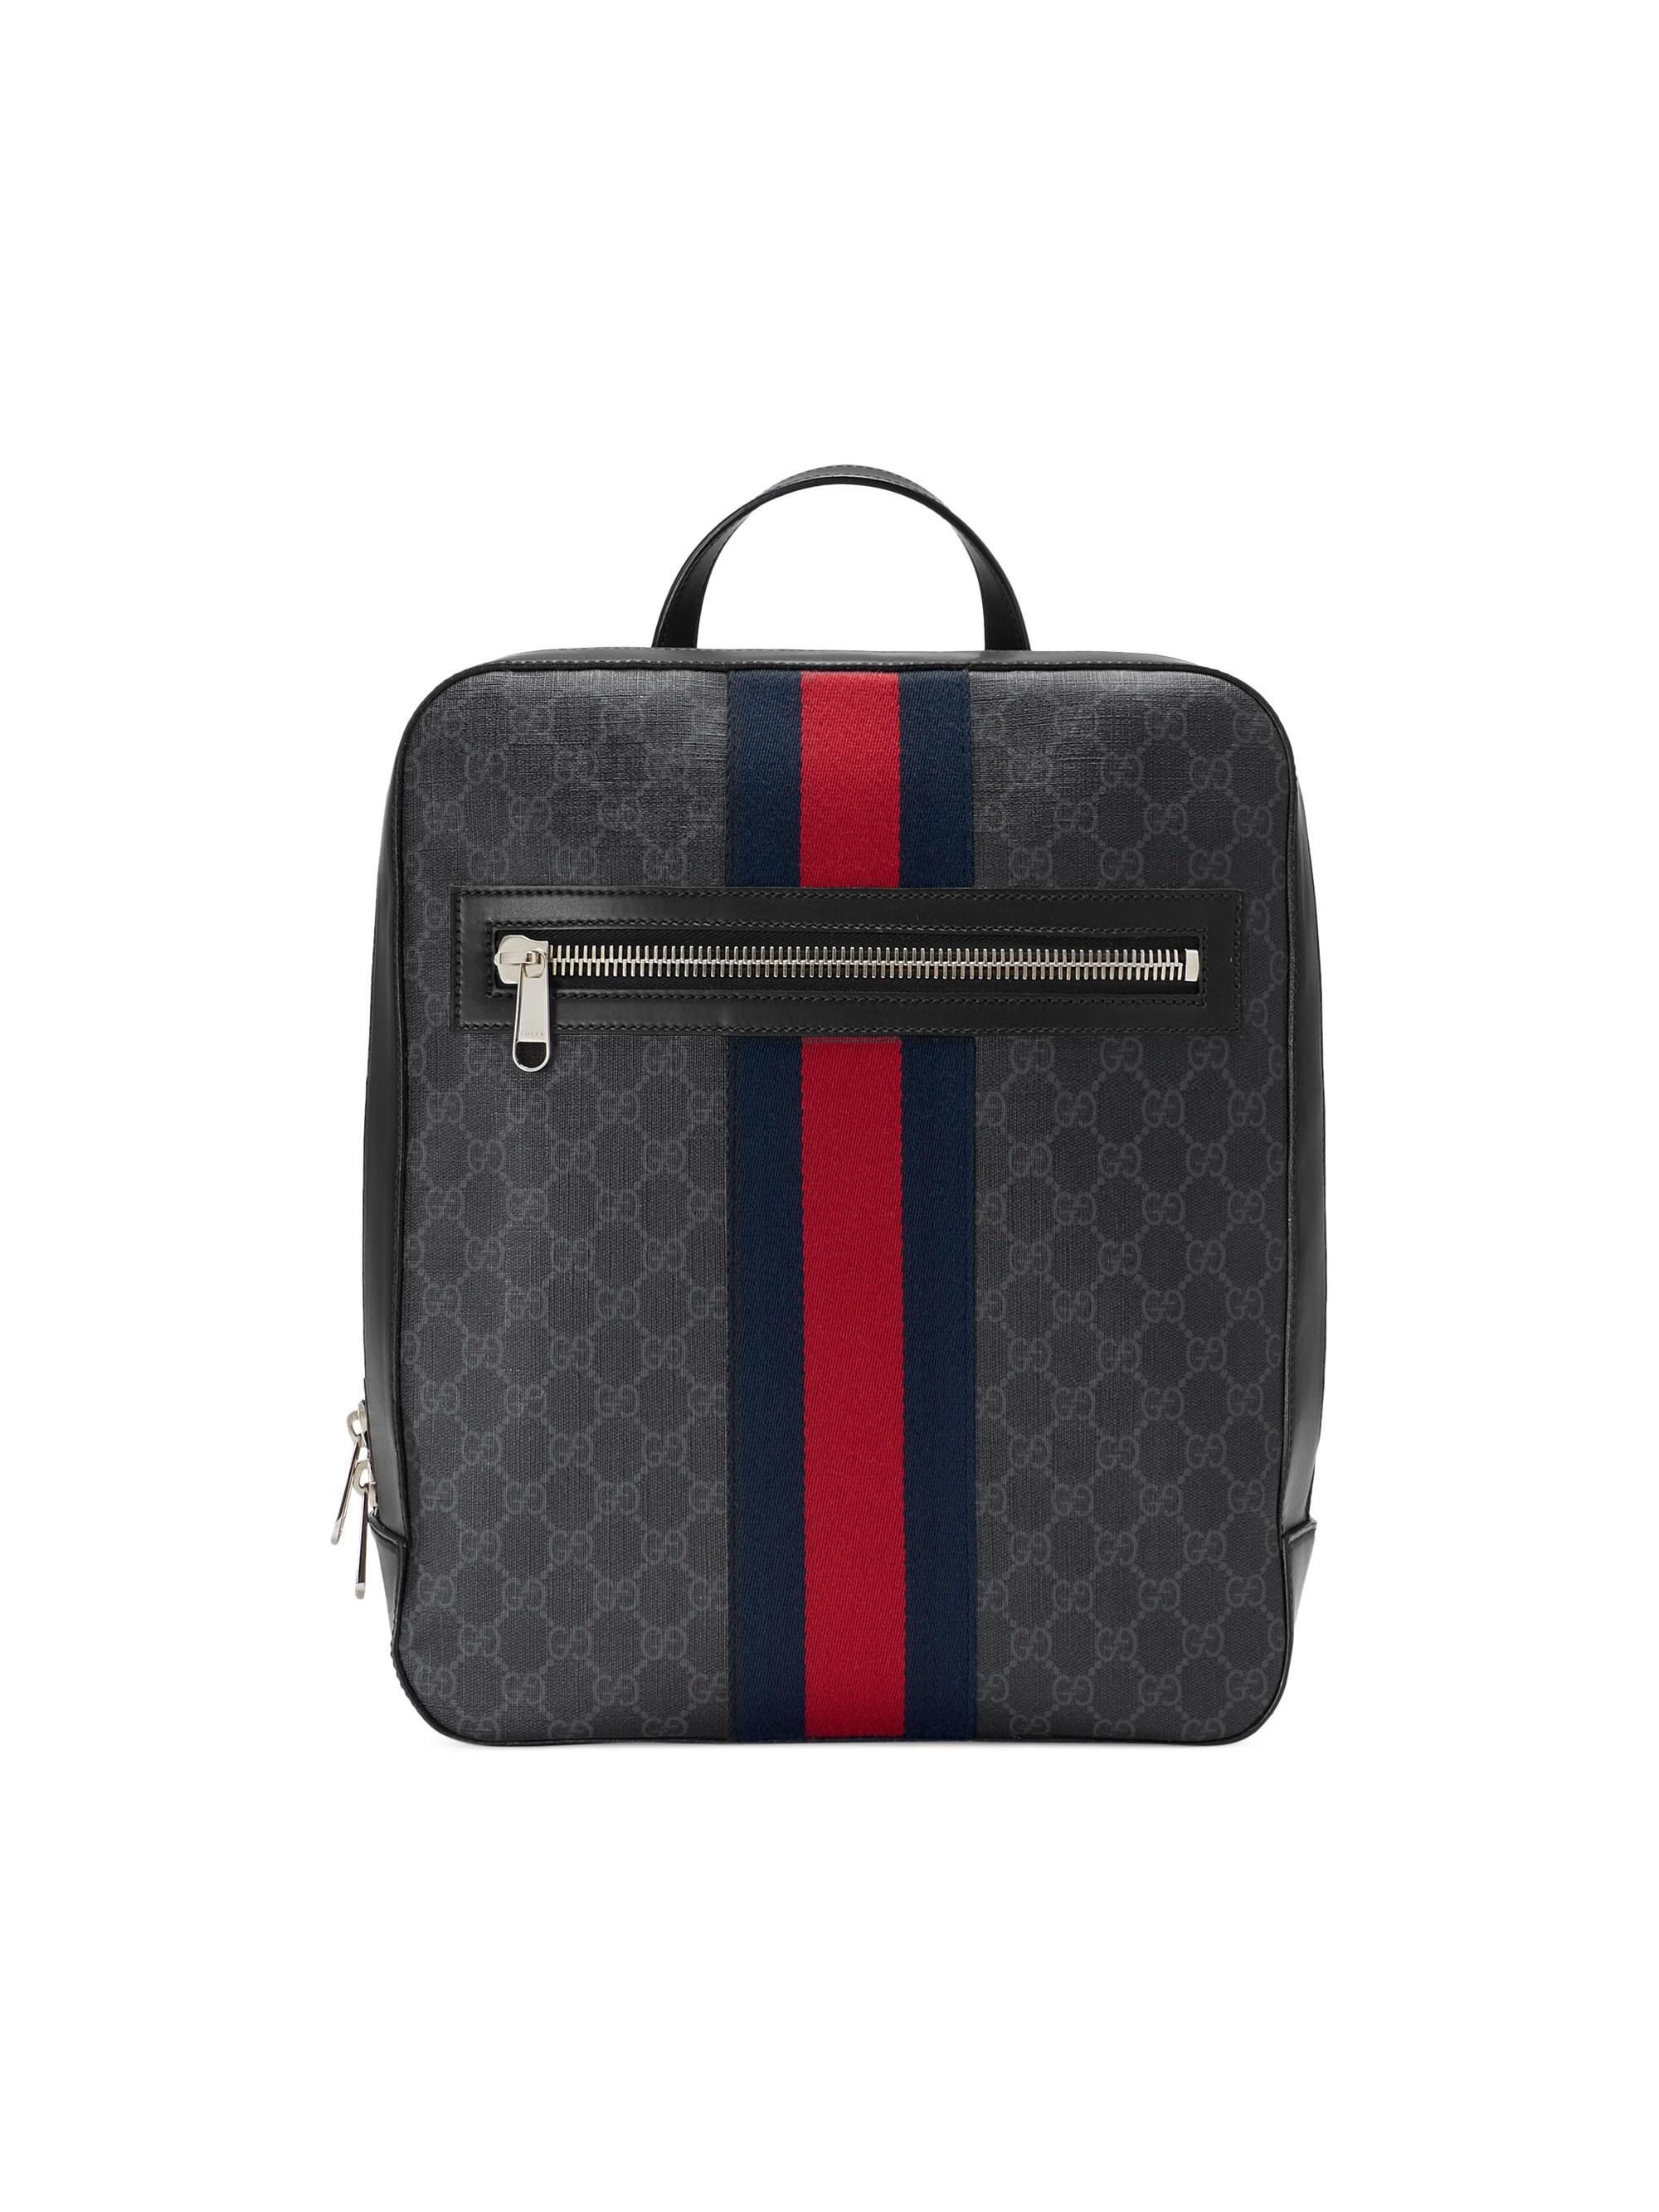 418645ad1611db Gucci Men's GG Supreme Web Backpack - Black Grey Blue Red in Black ...